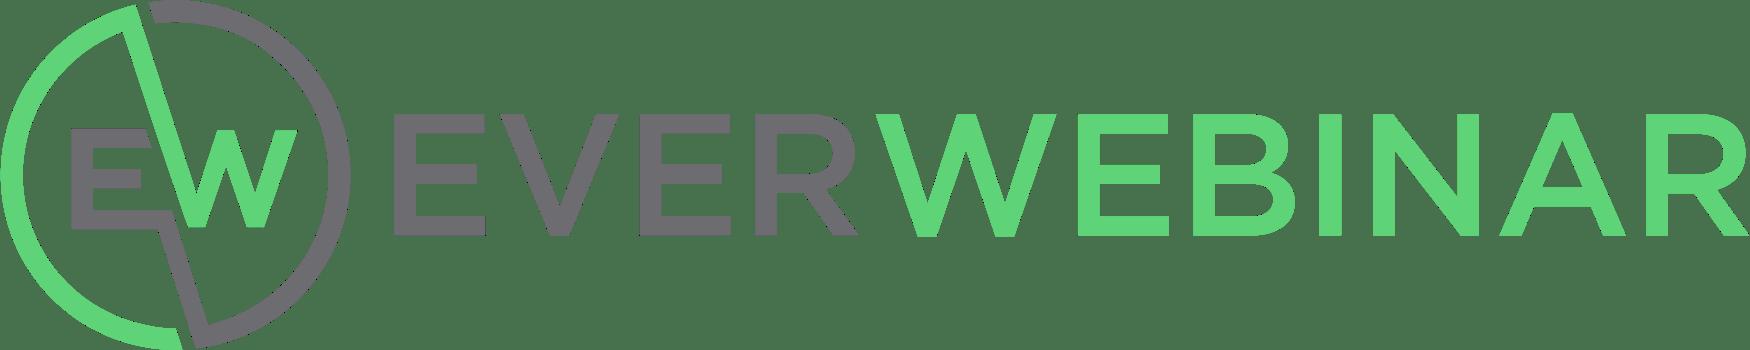 EverWebinar Automated Webinar Software